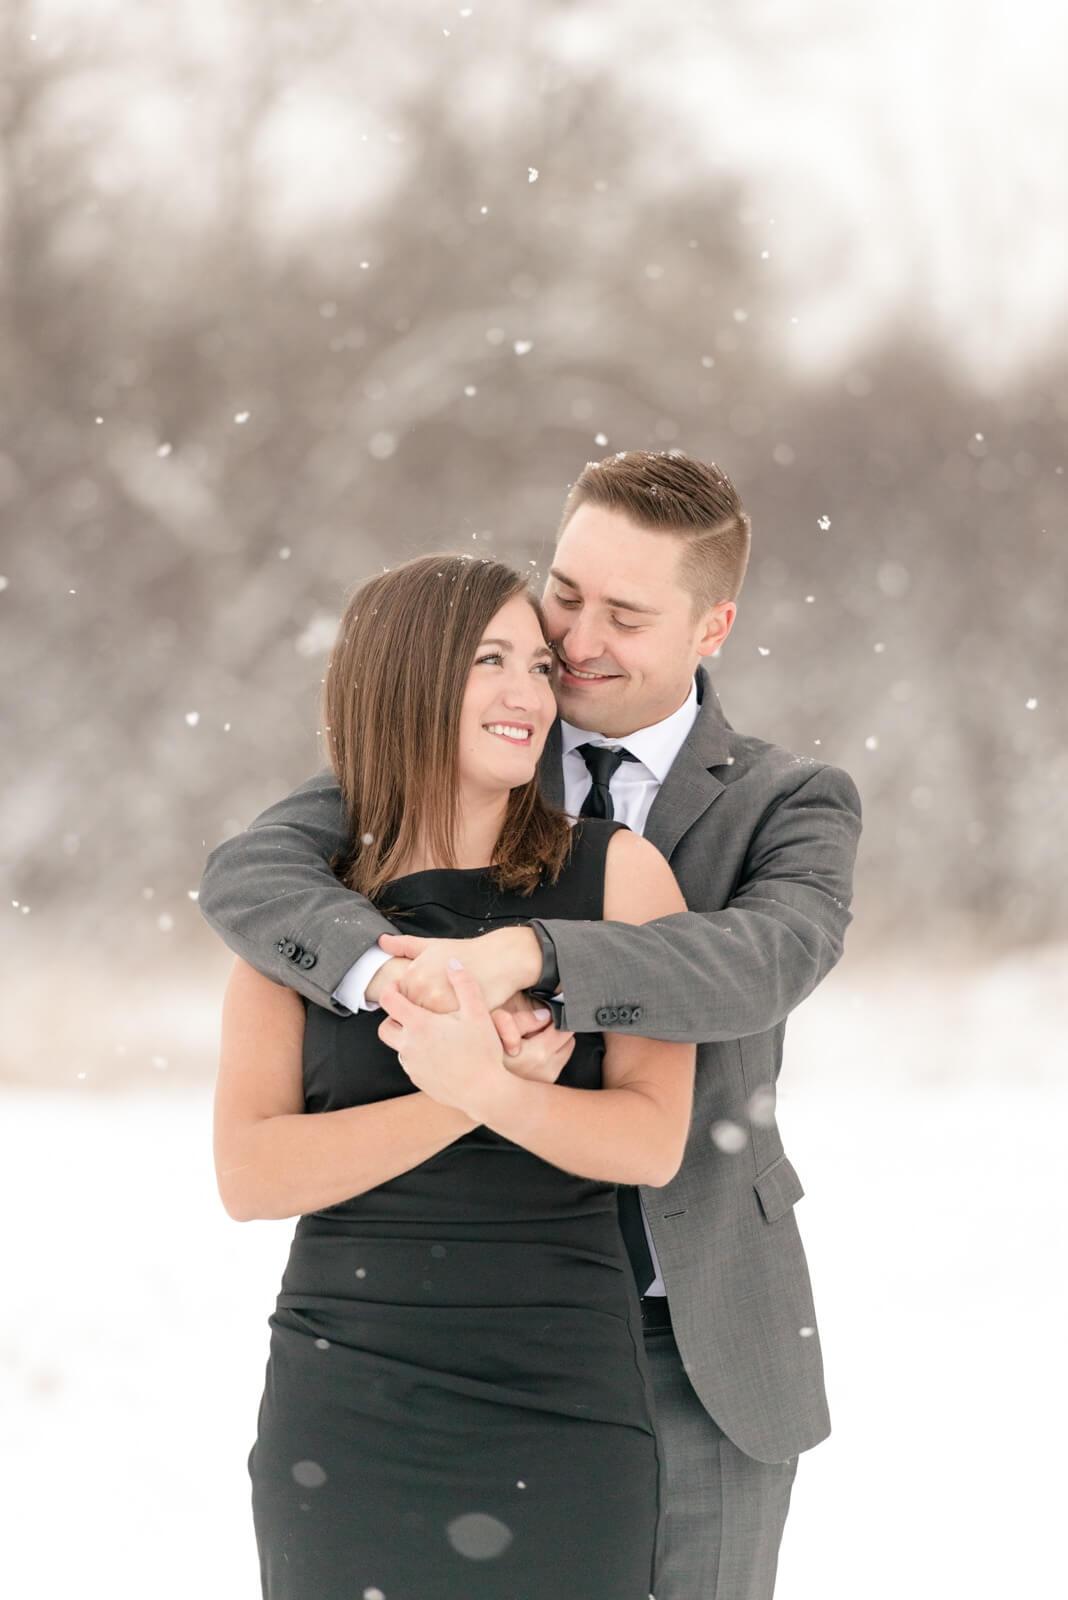 Regina Engagement Photographer - Mark-Kyra - Winter Engagement